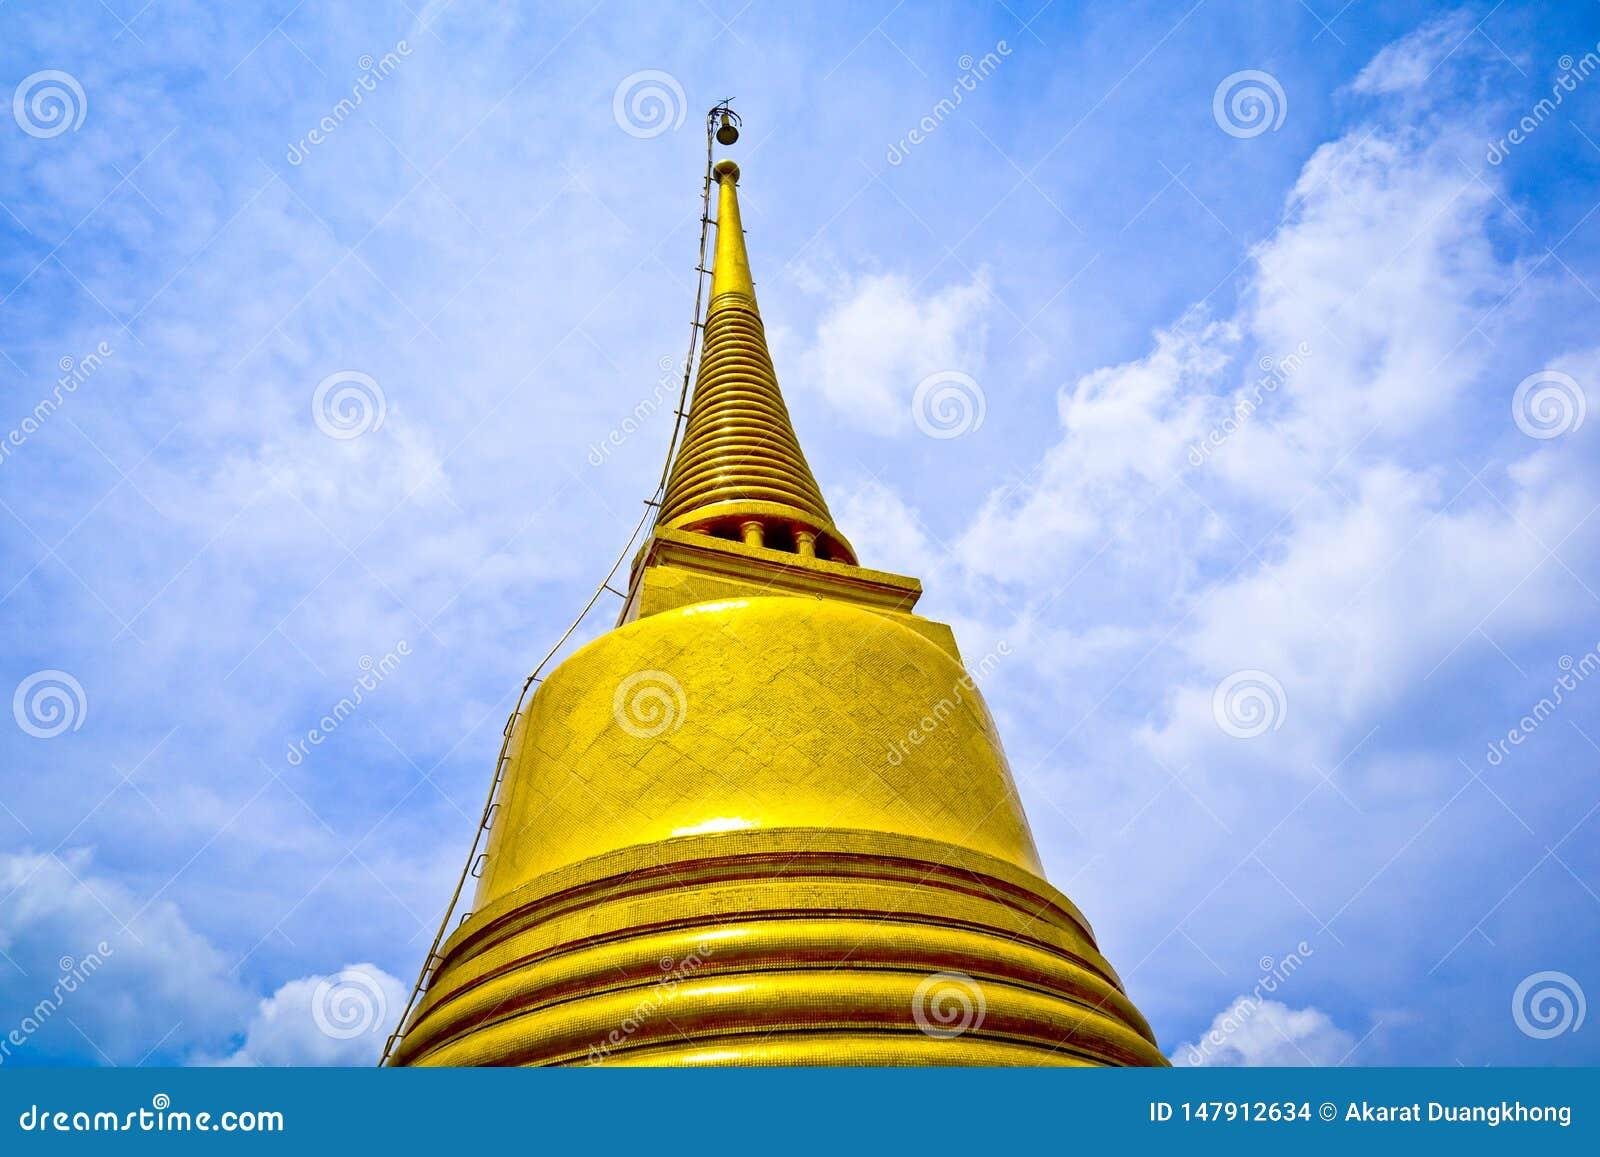 Gould pagoda and biue sky